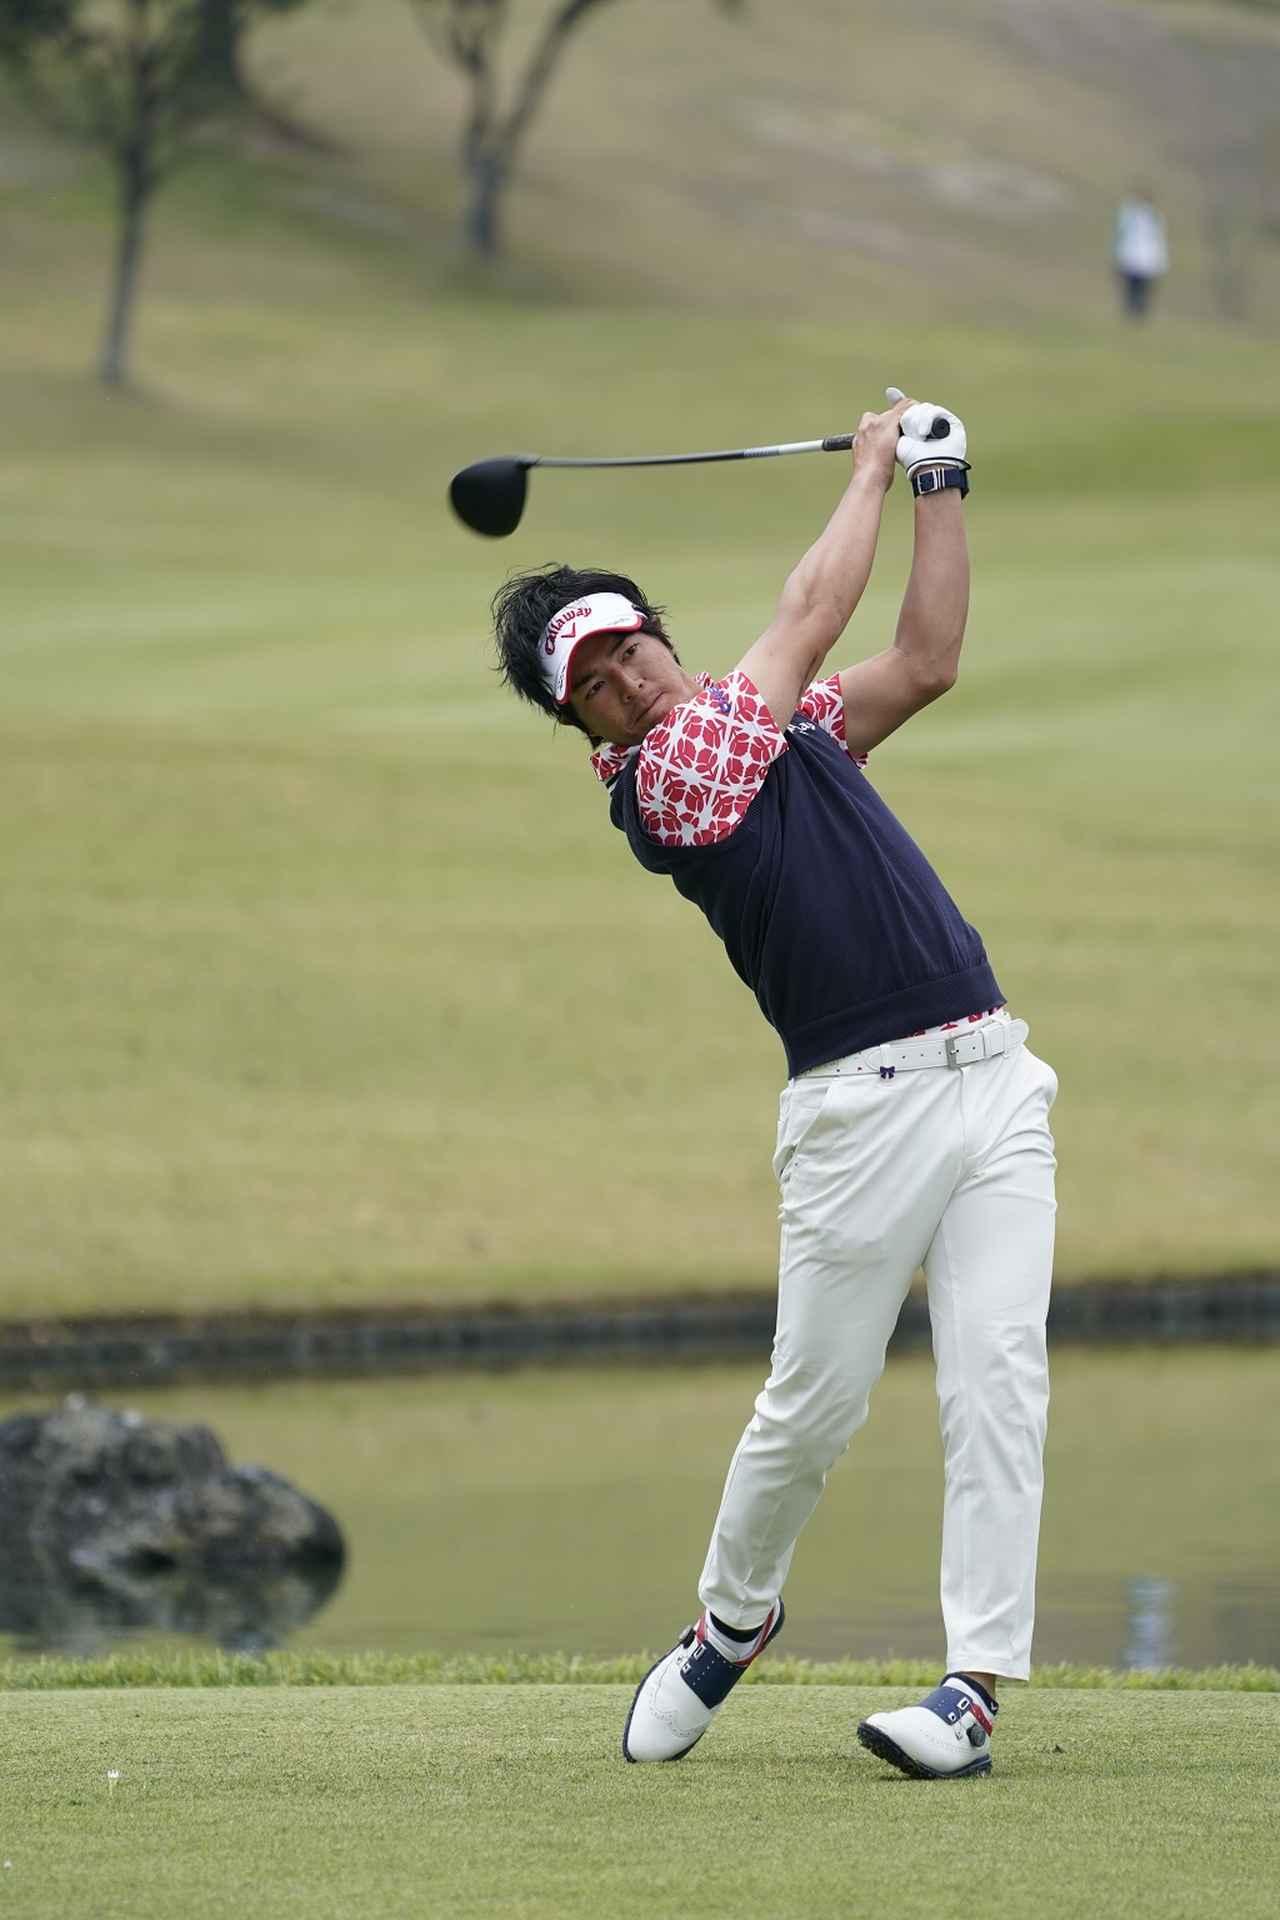 Images : 15番目の画像 - 石川遼ドライバー前方連続写真 - みんなのゴルフダイジェスト